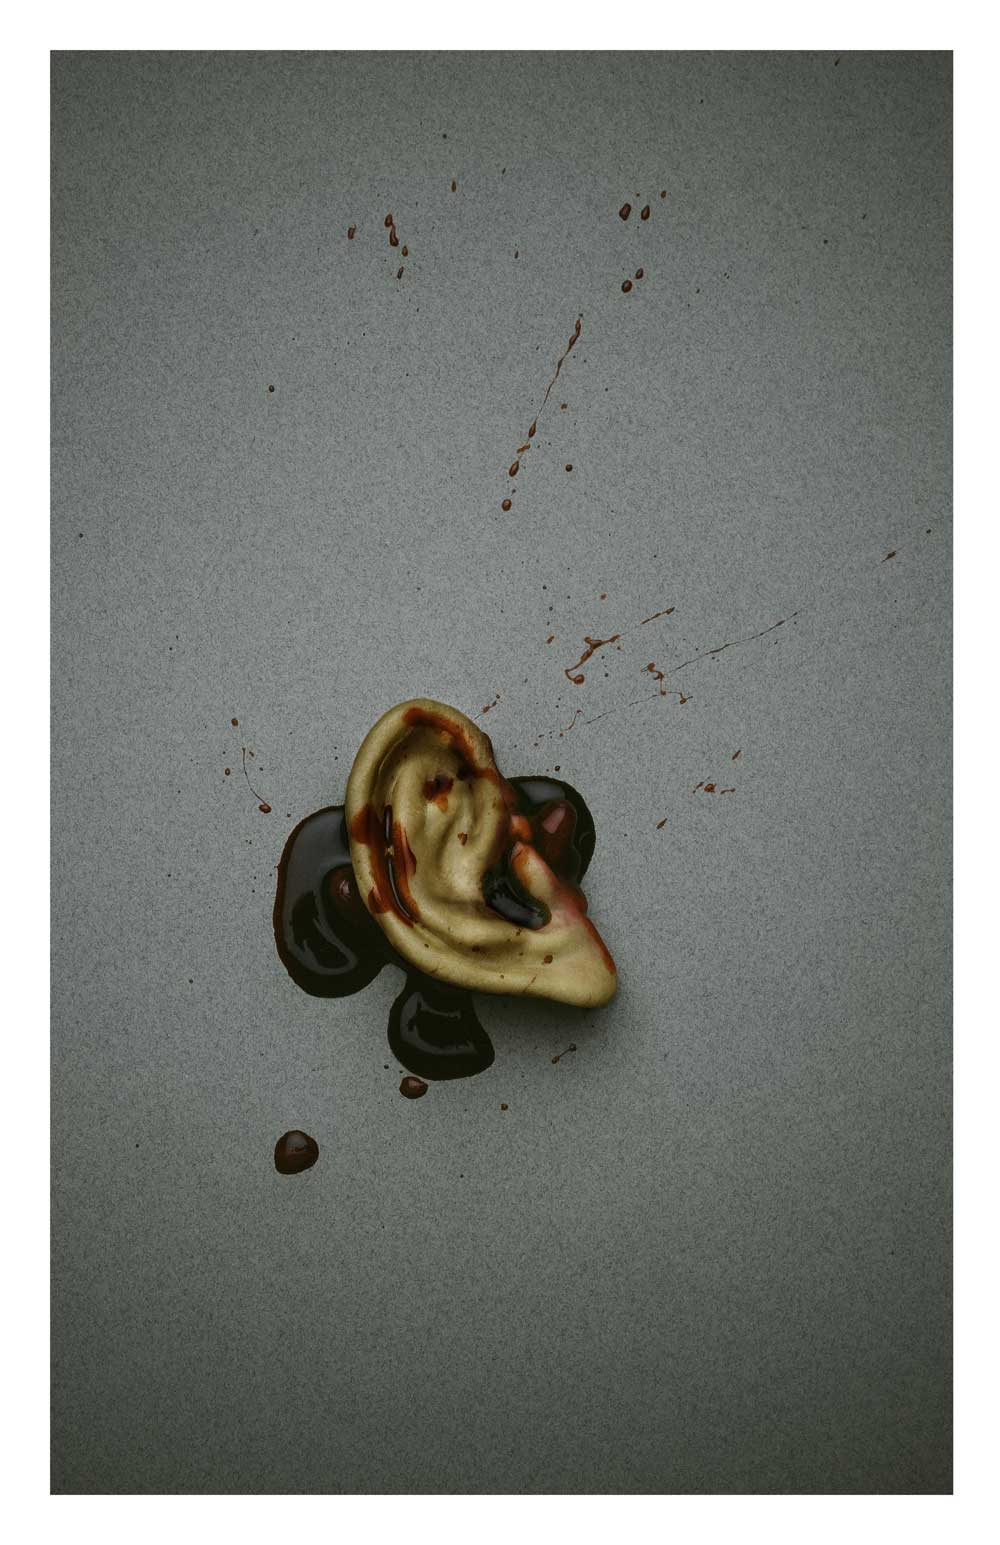 Minimalist Reservoir Dogs by Jacob Kuddes and Ben Lundsten